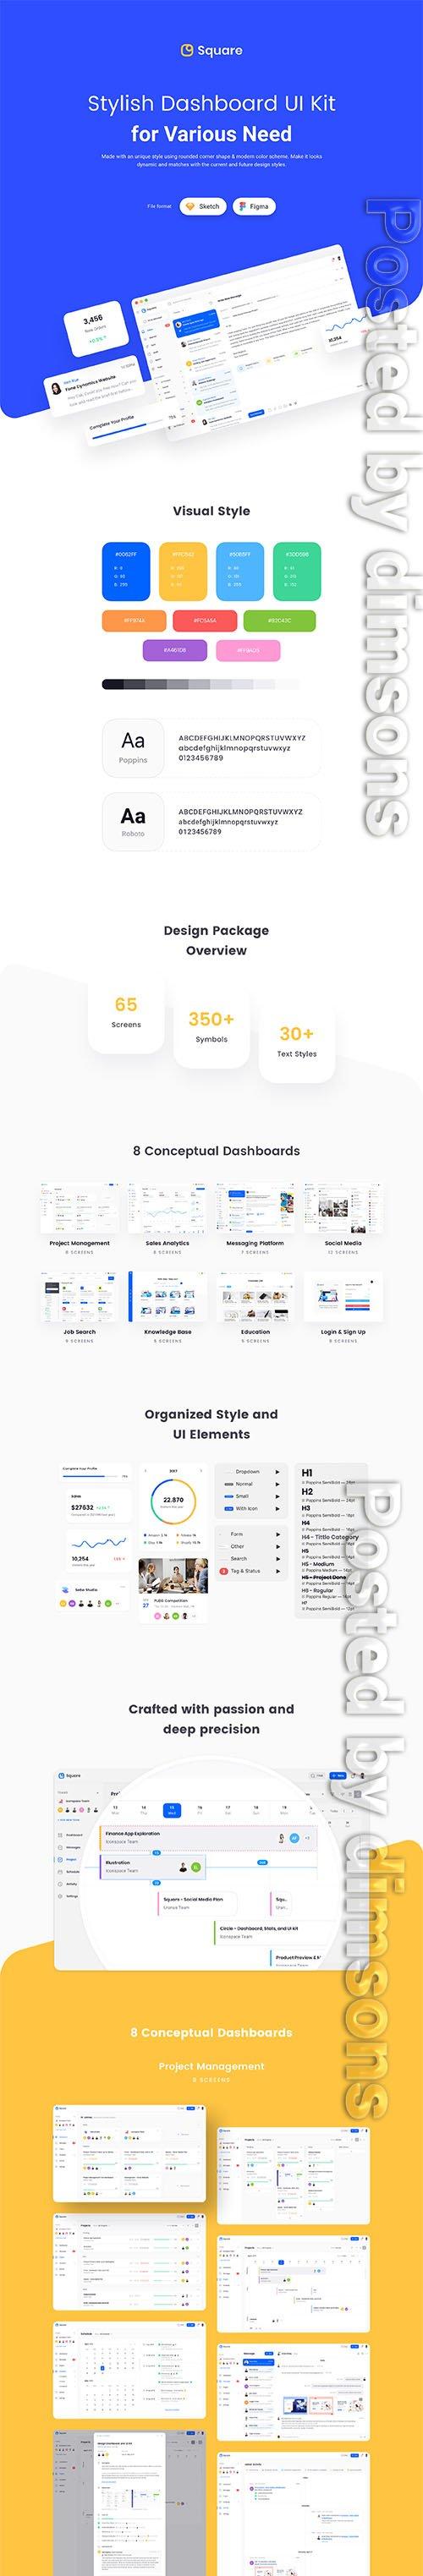 Square Dashboard UI Kit (NEW UPDATE) - UI8